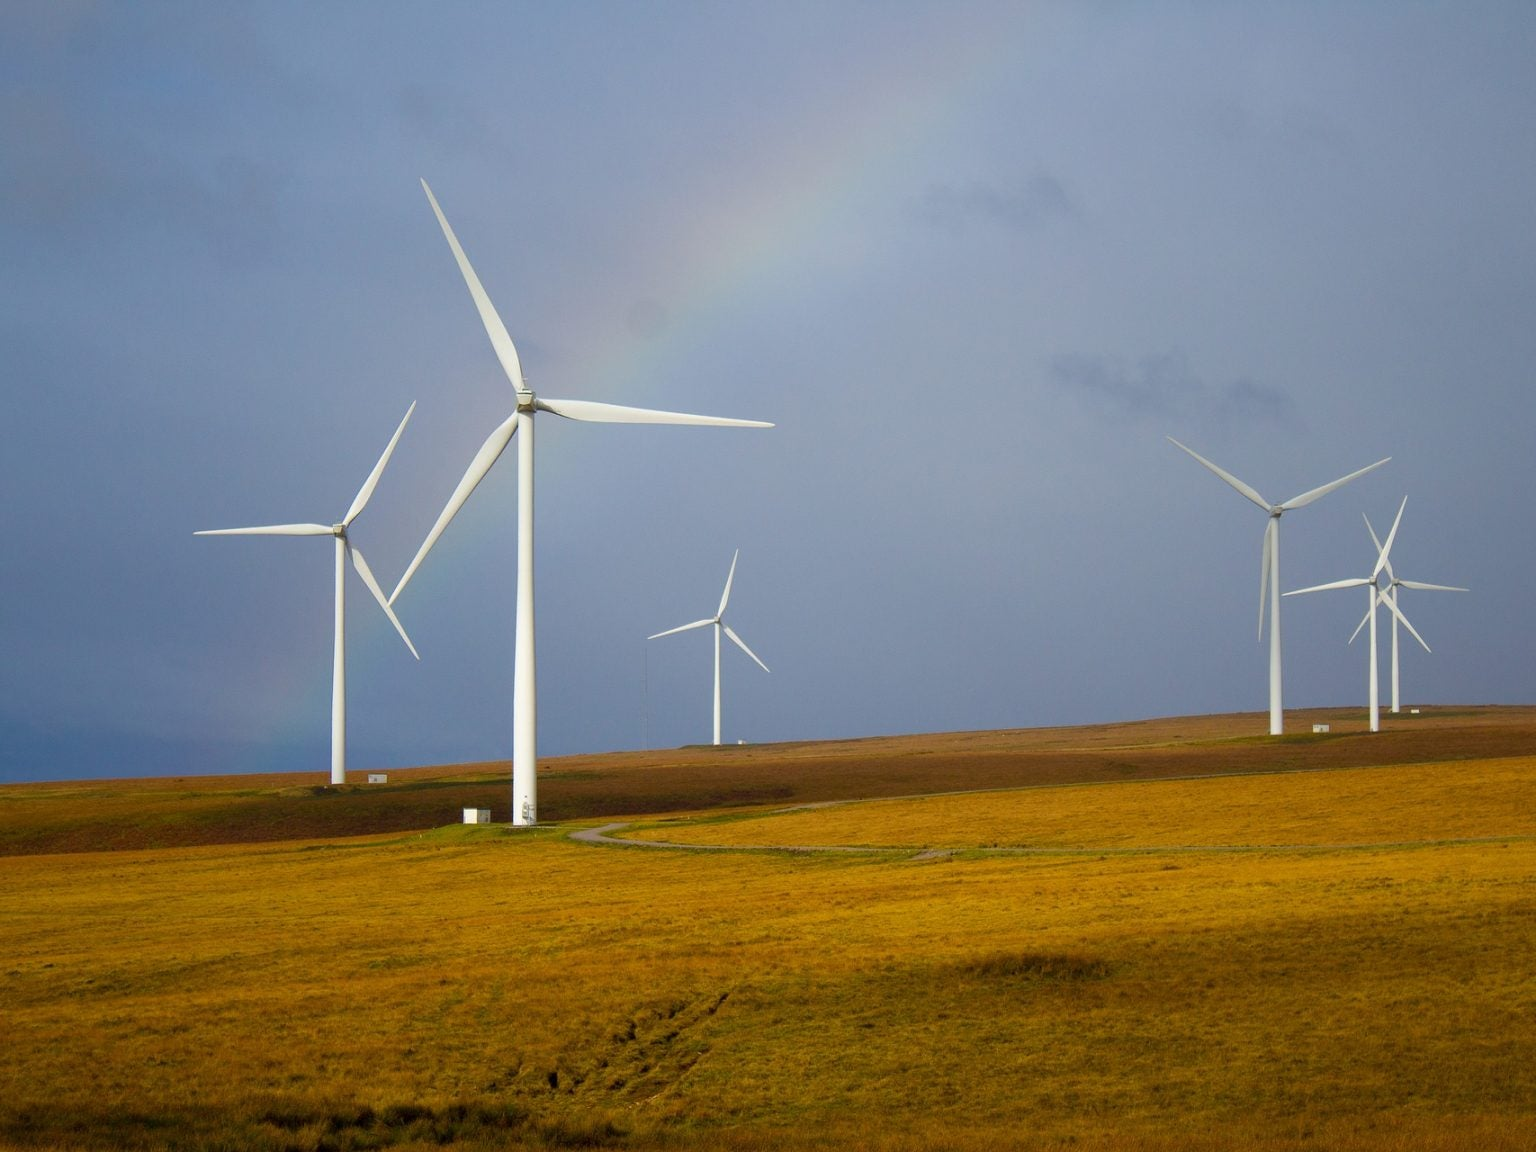 Windmills, but those big metal ones